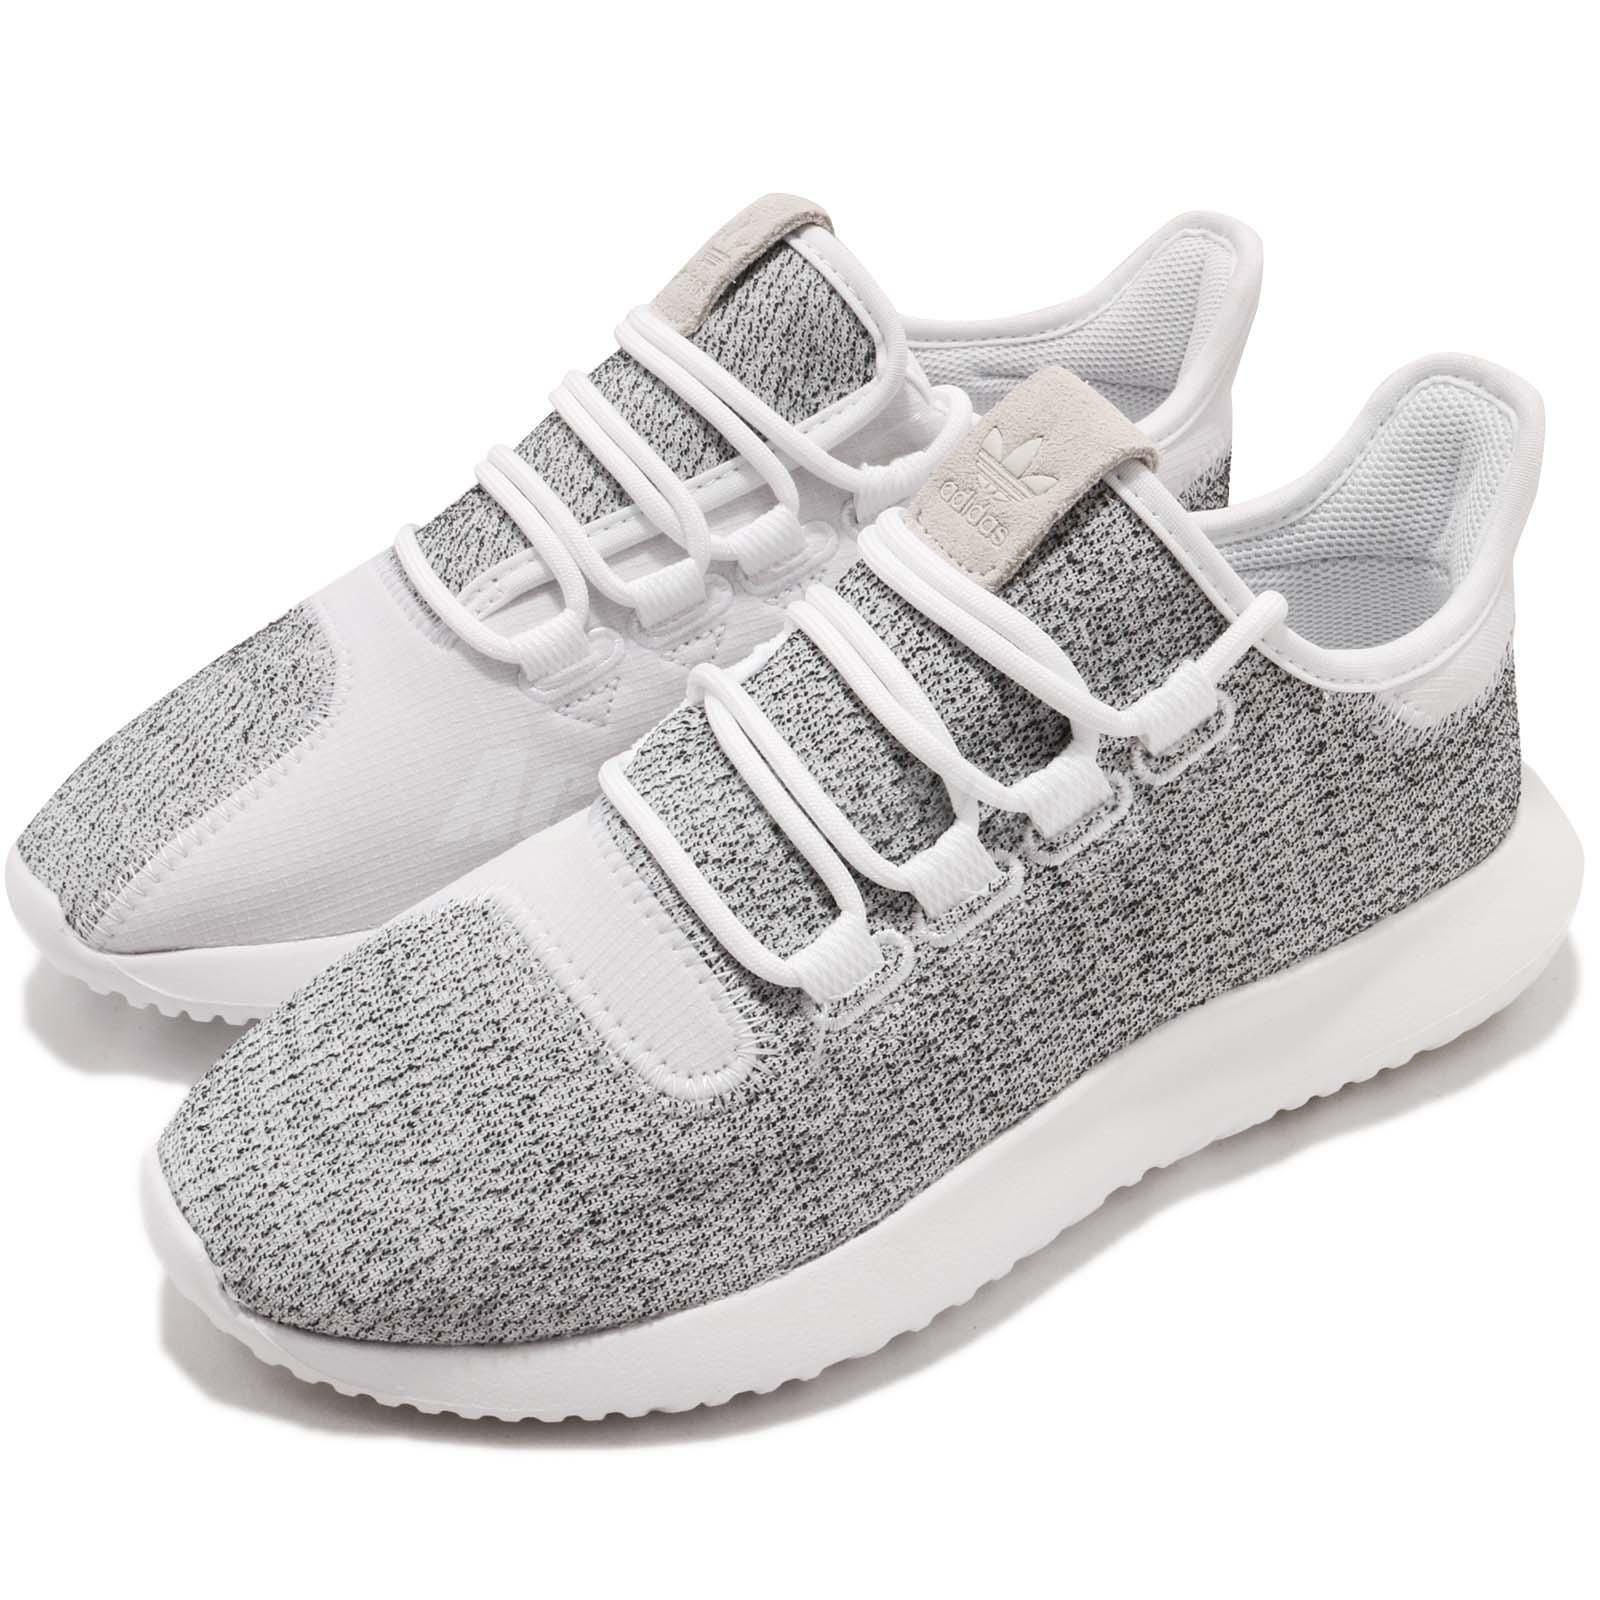 adidas Originals Tubular Shadow Footwear blanc  Gris  One hommes Running Shoes CQ0928